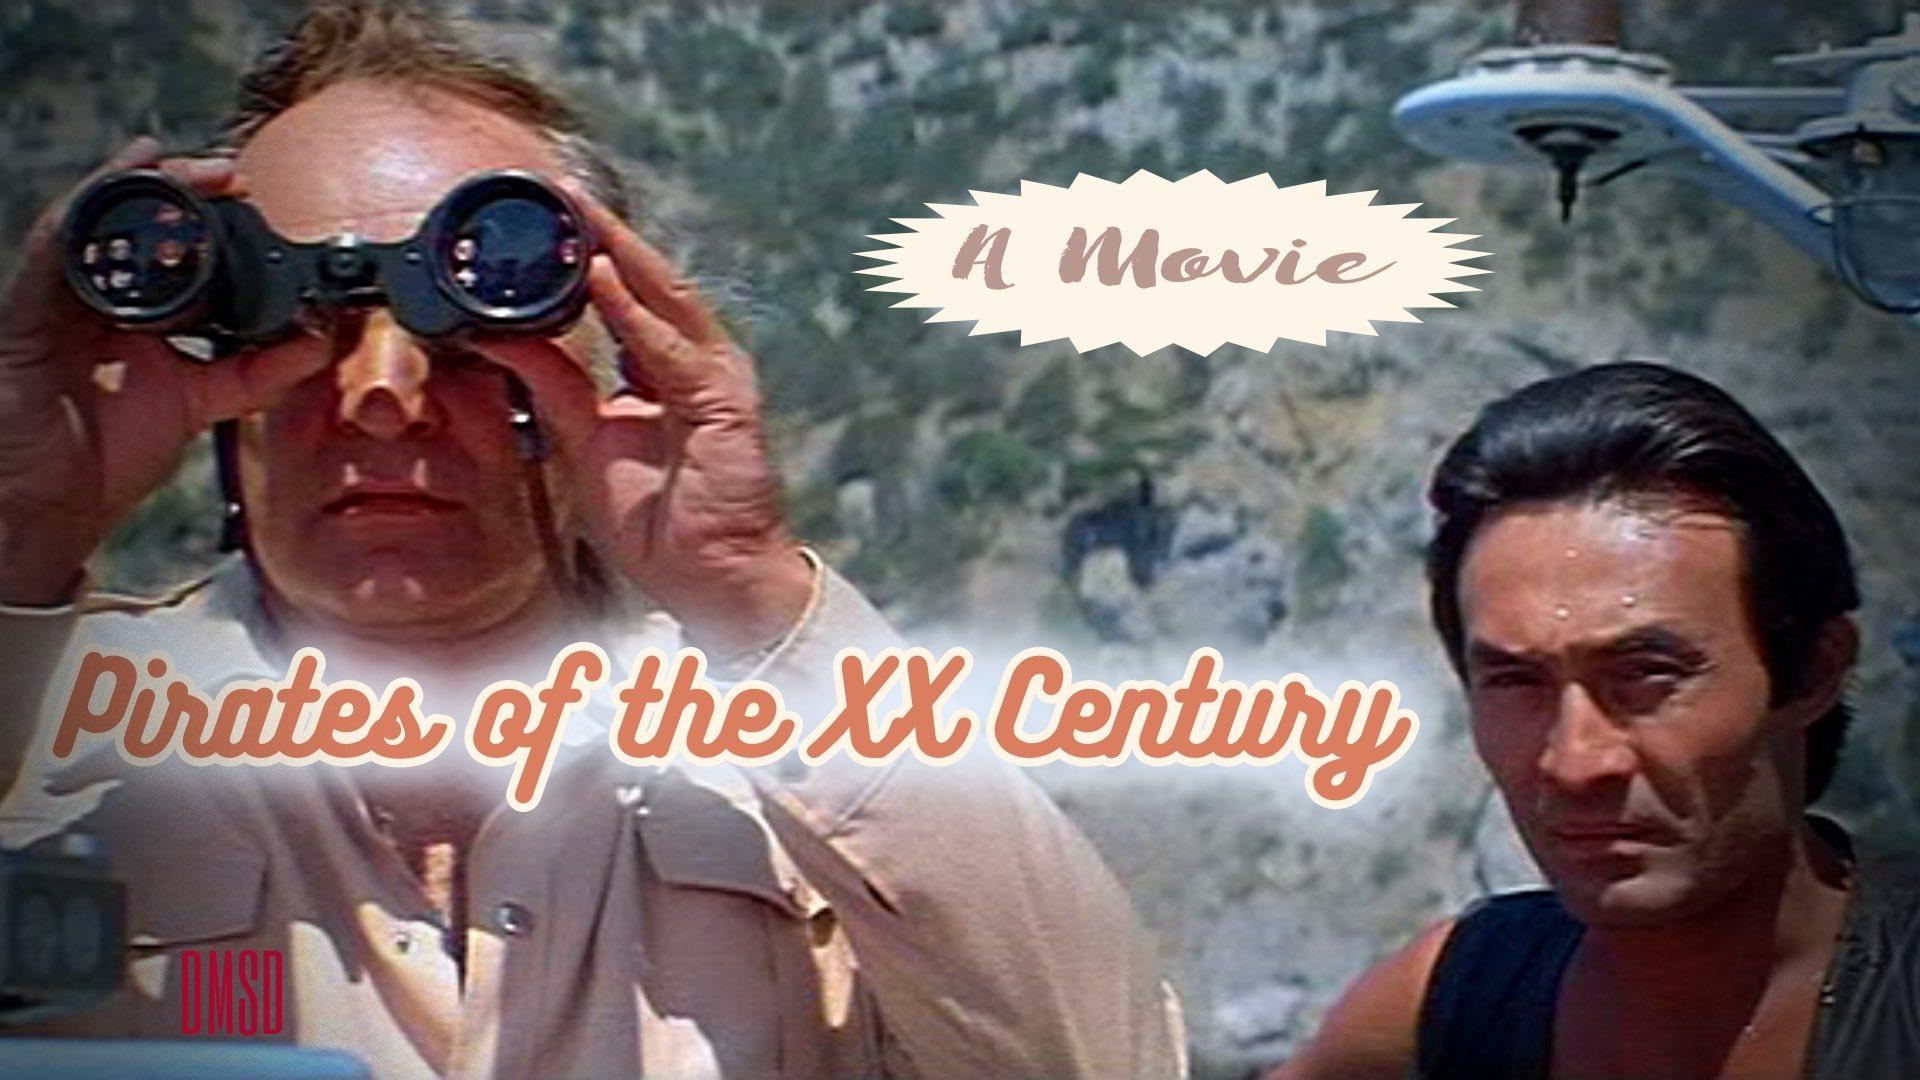 Pirates of the XX Century [1980]